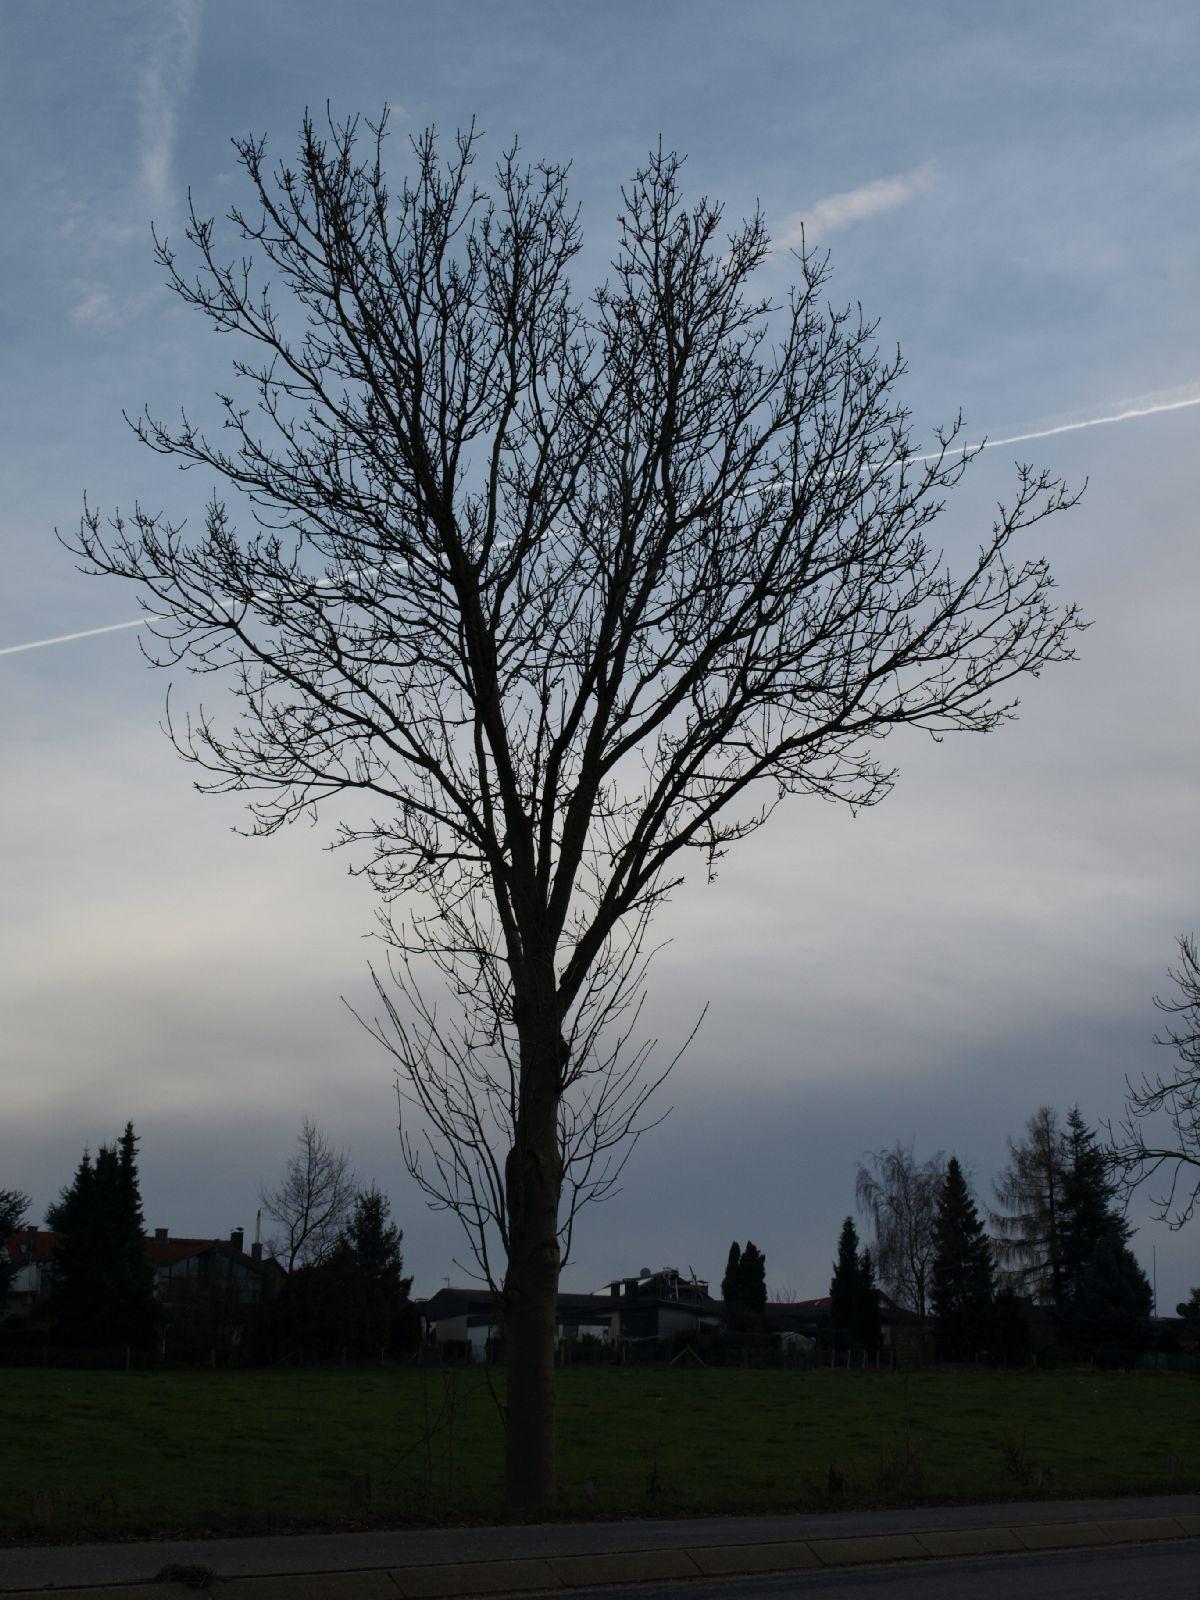 Pflanzen-Baum-Silhouette-Foto_Textur_B_PC147687